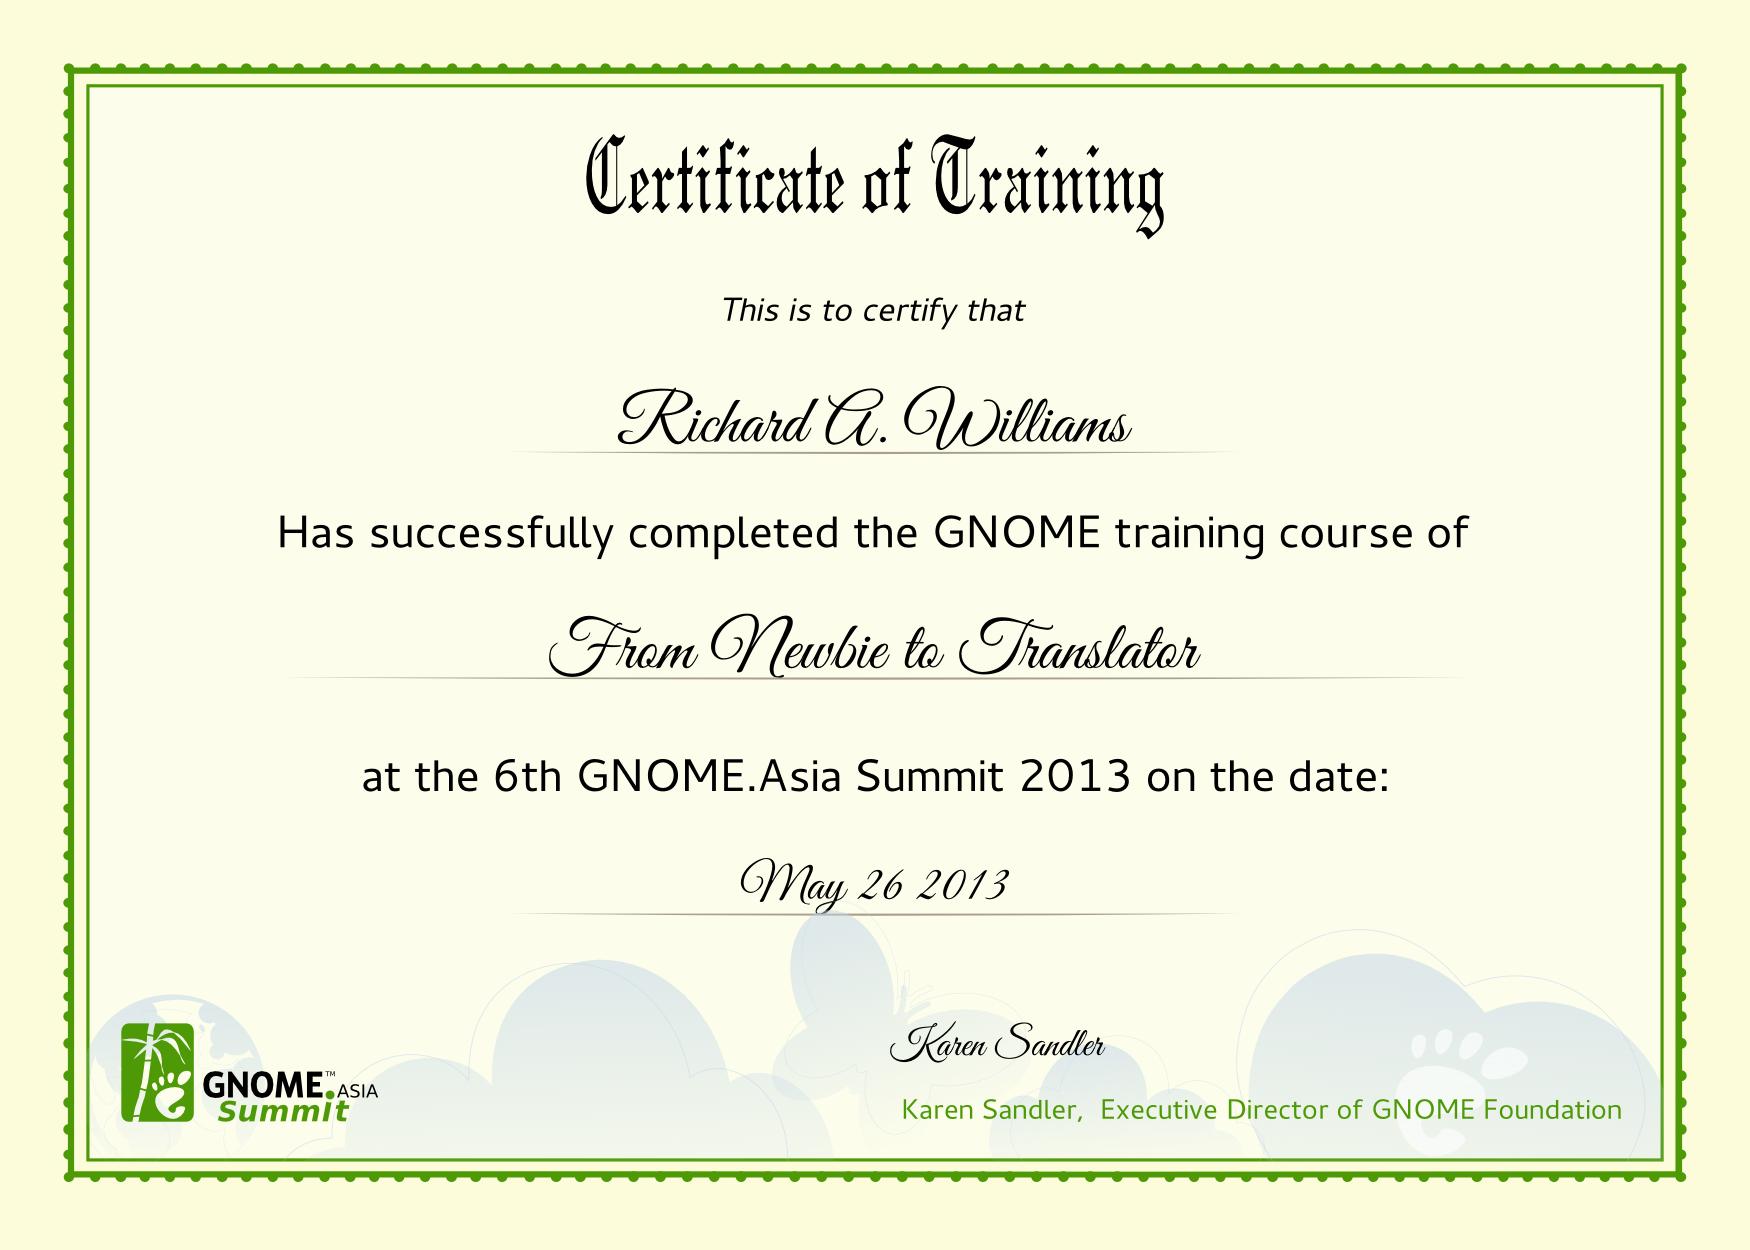 Downloadnewleadershipawardtemplate For Leadership Award Certificate Template